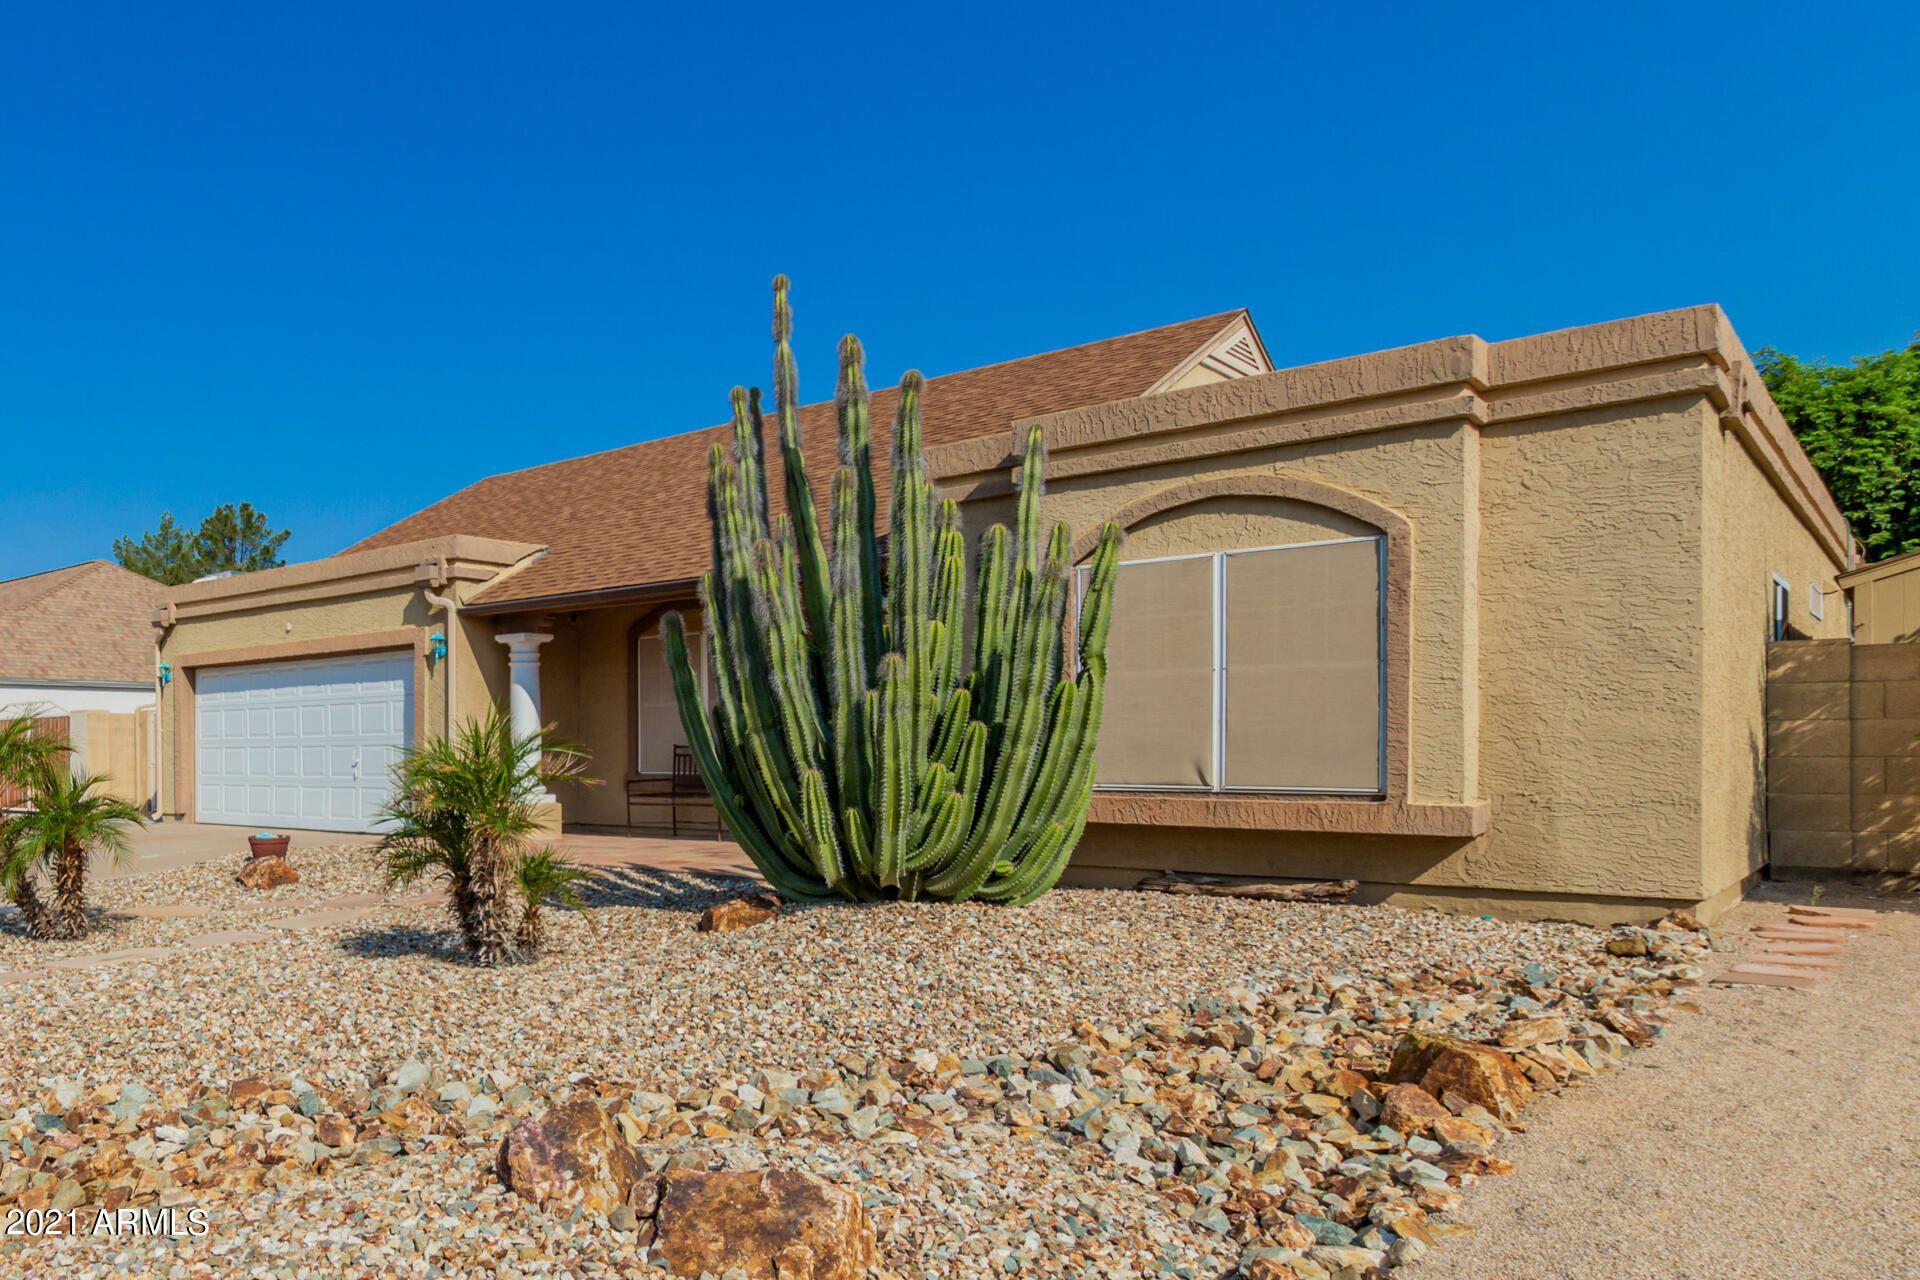 Photo of 6908 W SUNNYSIDE Drive, Peoria, AZ 85345 (MLS # 6294634)